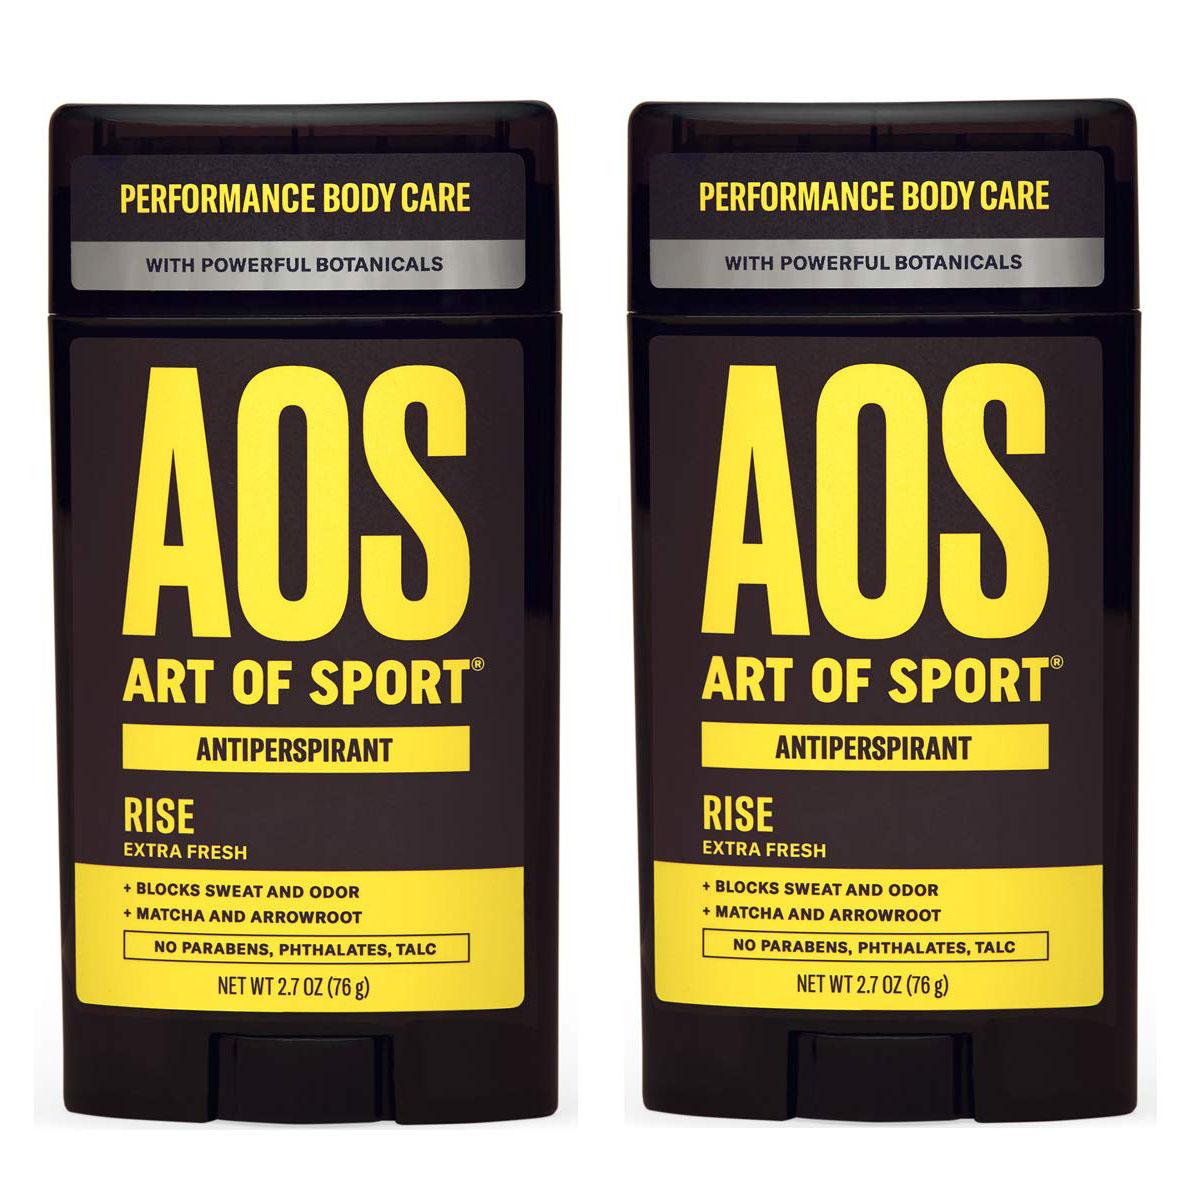 Art of Sport Men's Antiperspirant Deodorant Stick